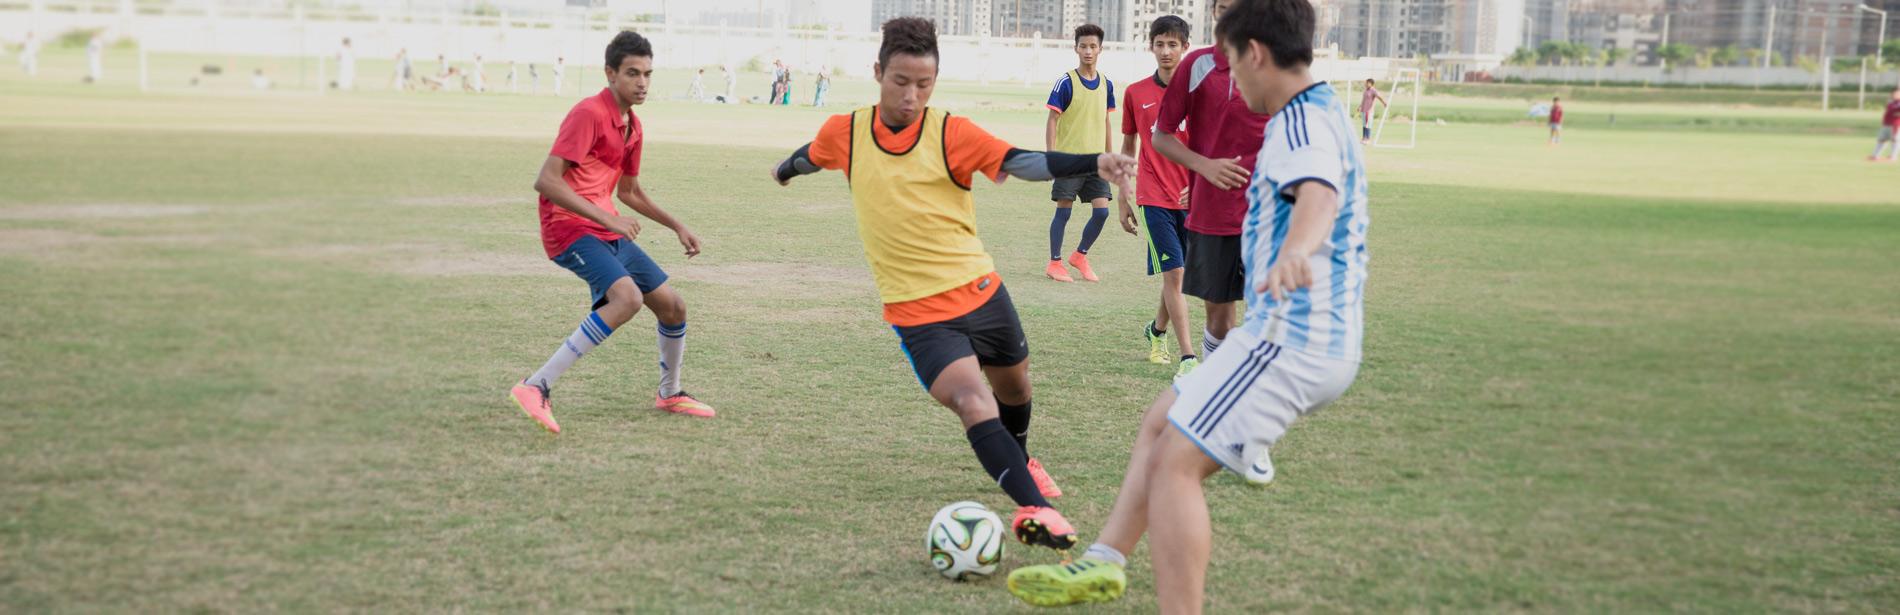 Football:image